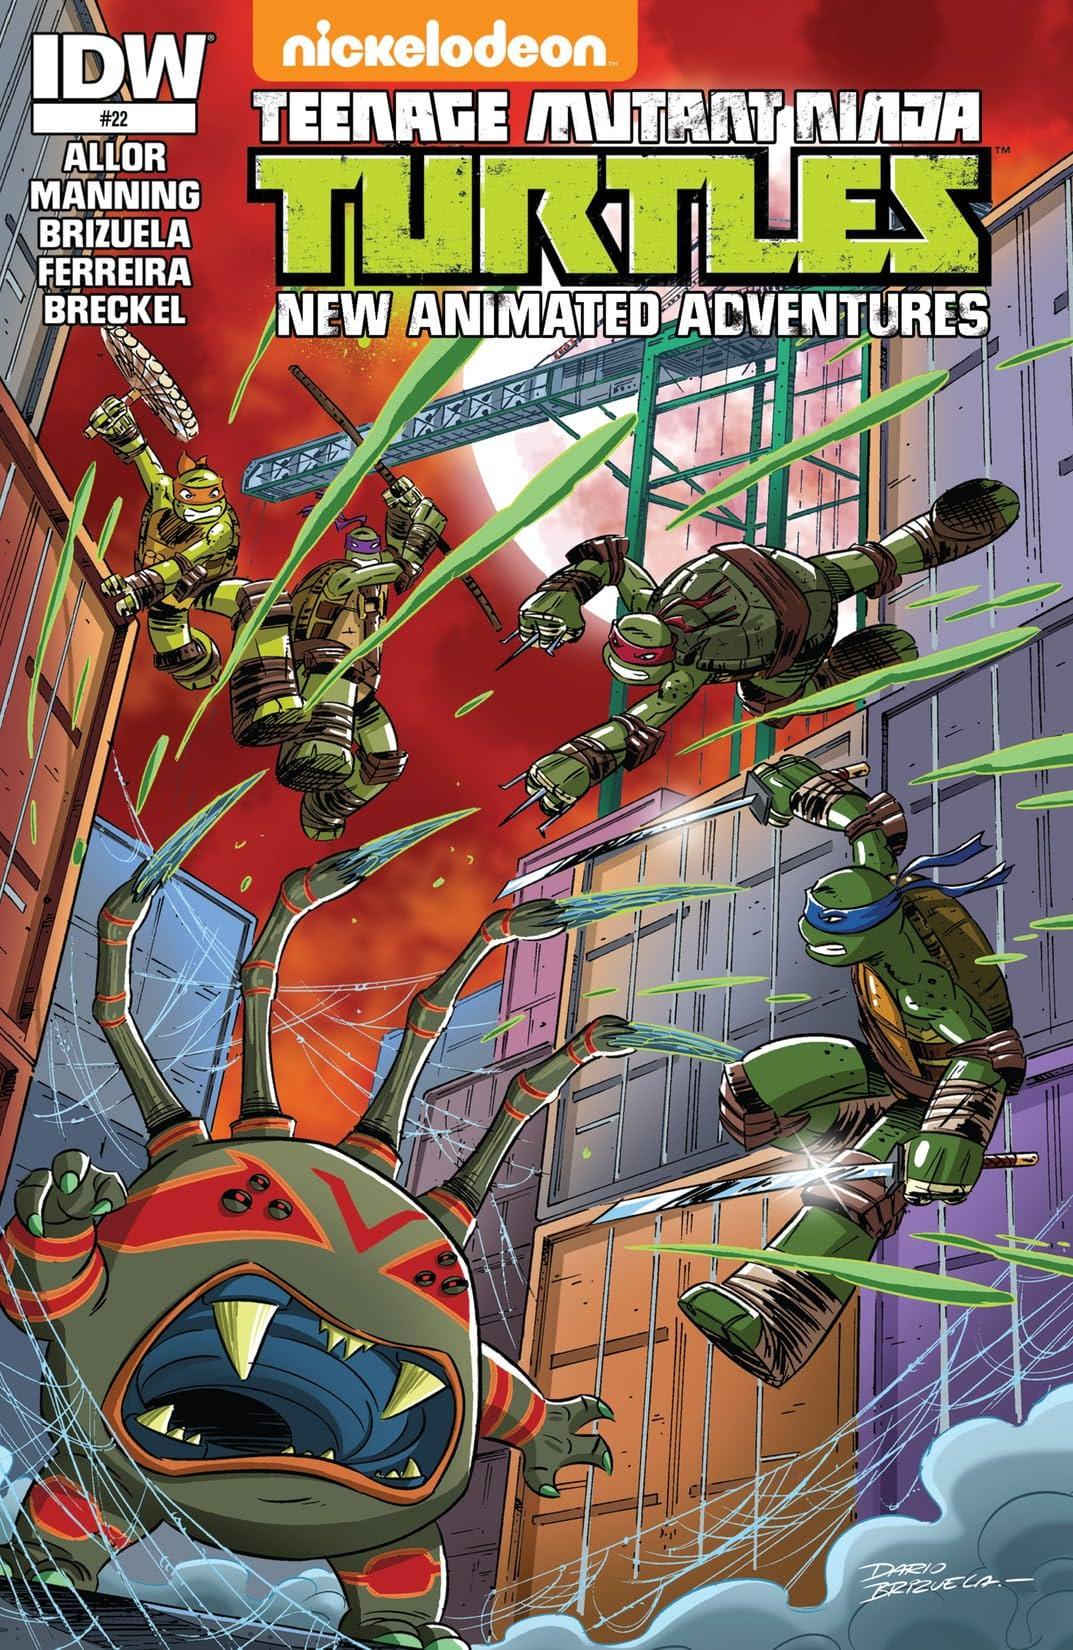 May, 2013 1st printing TMNT Teenage Mutant Ninja Turtles #22 IDW - Cover A